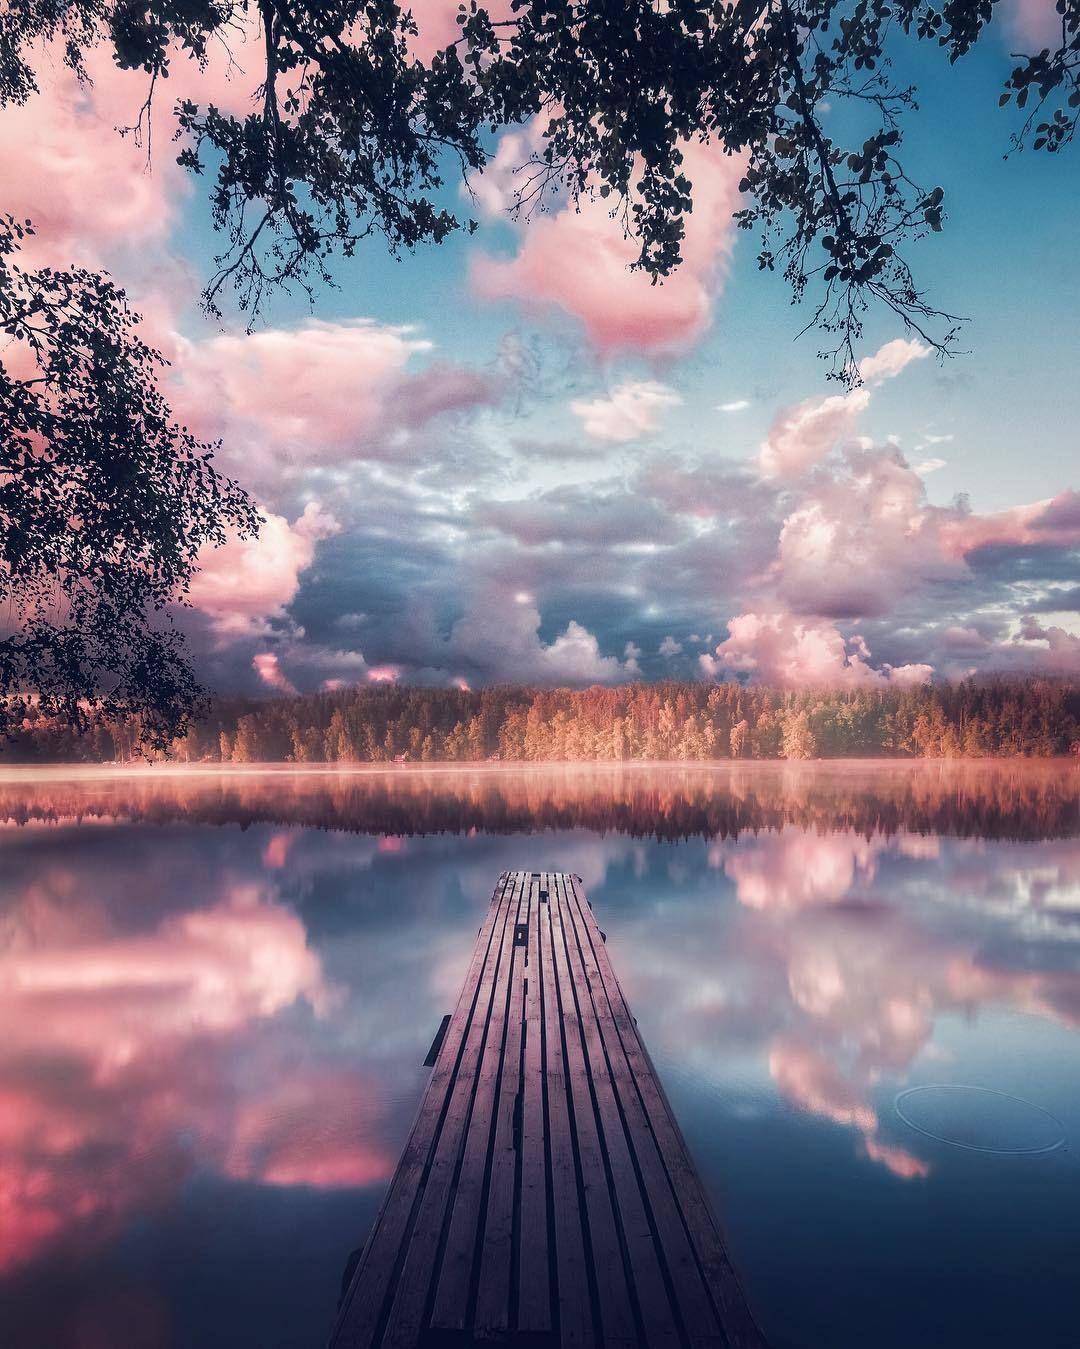 Artofvizuals Amazing Photography By Juuso Hamalainen Landscape Photography Nature Photography Nature